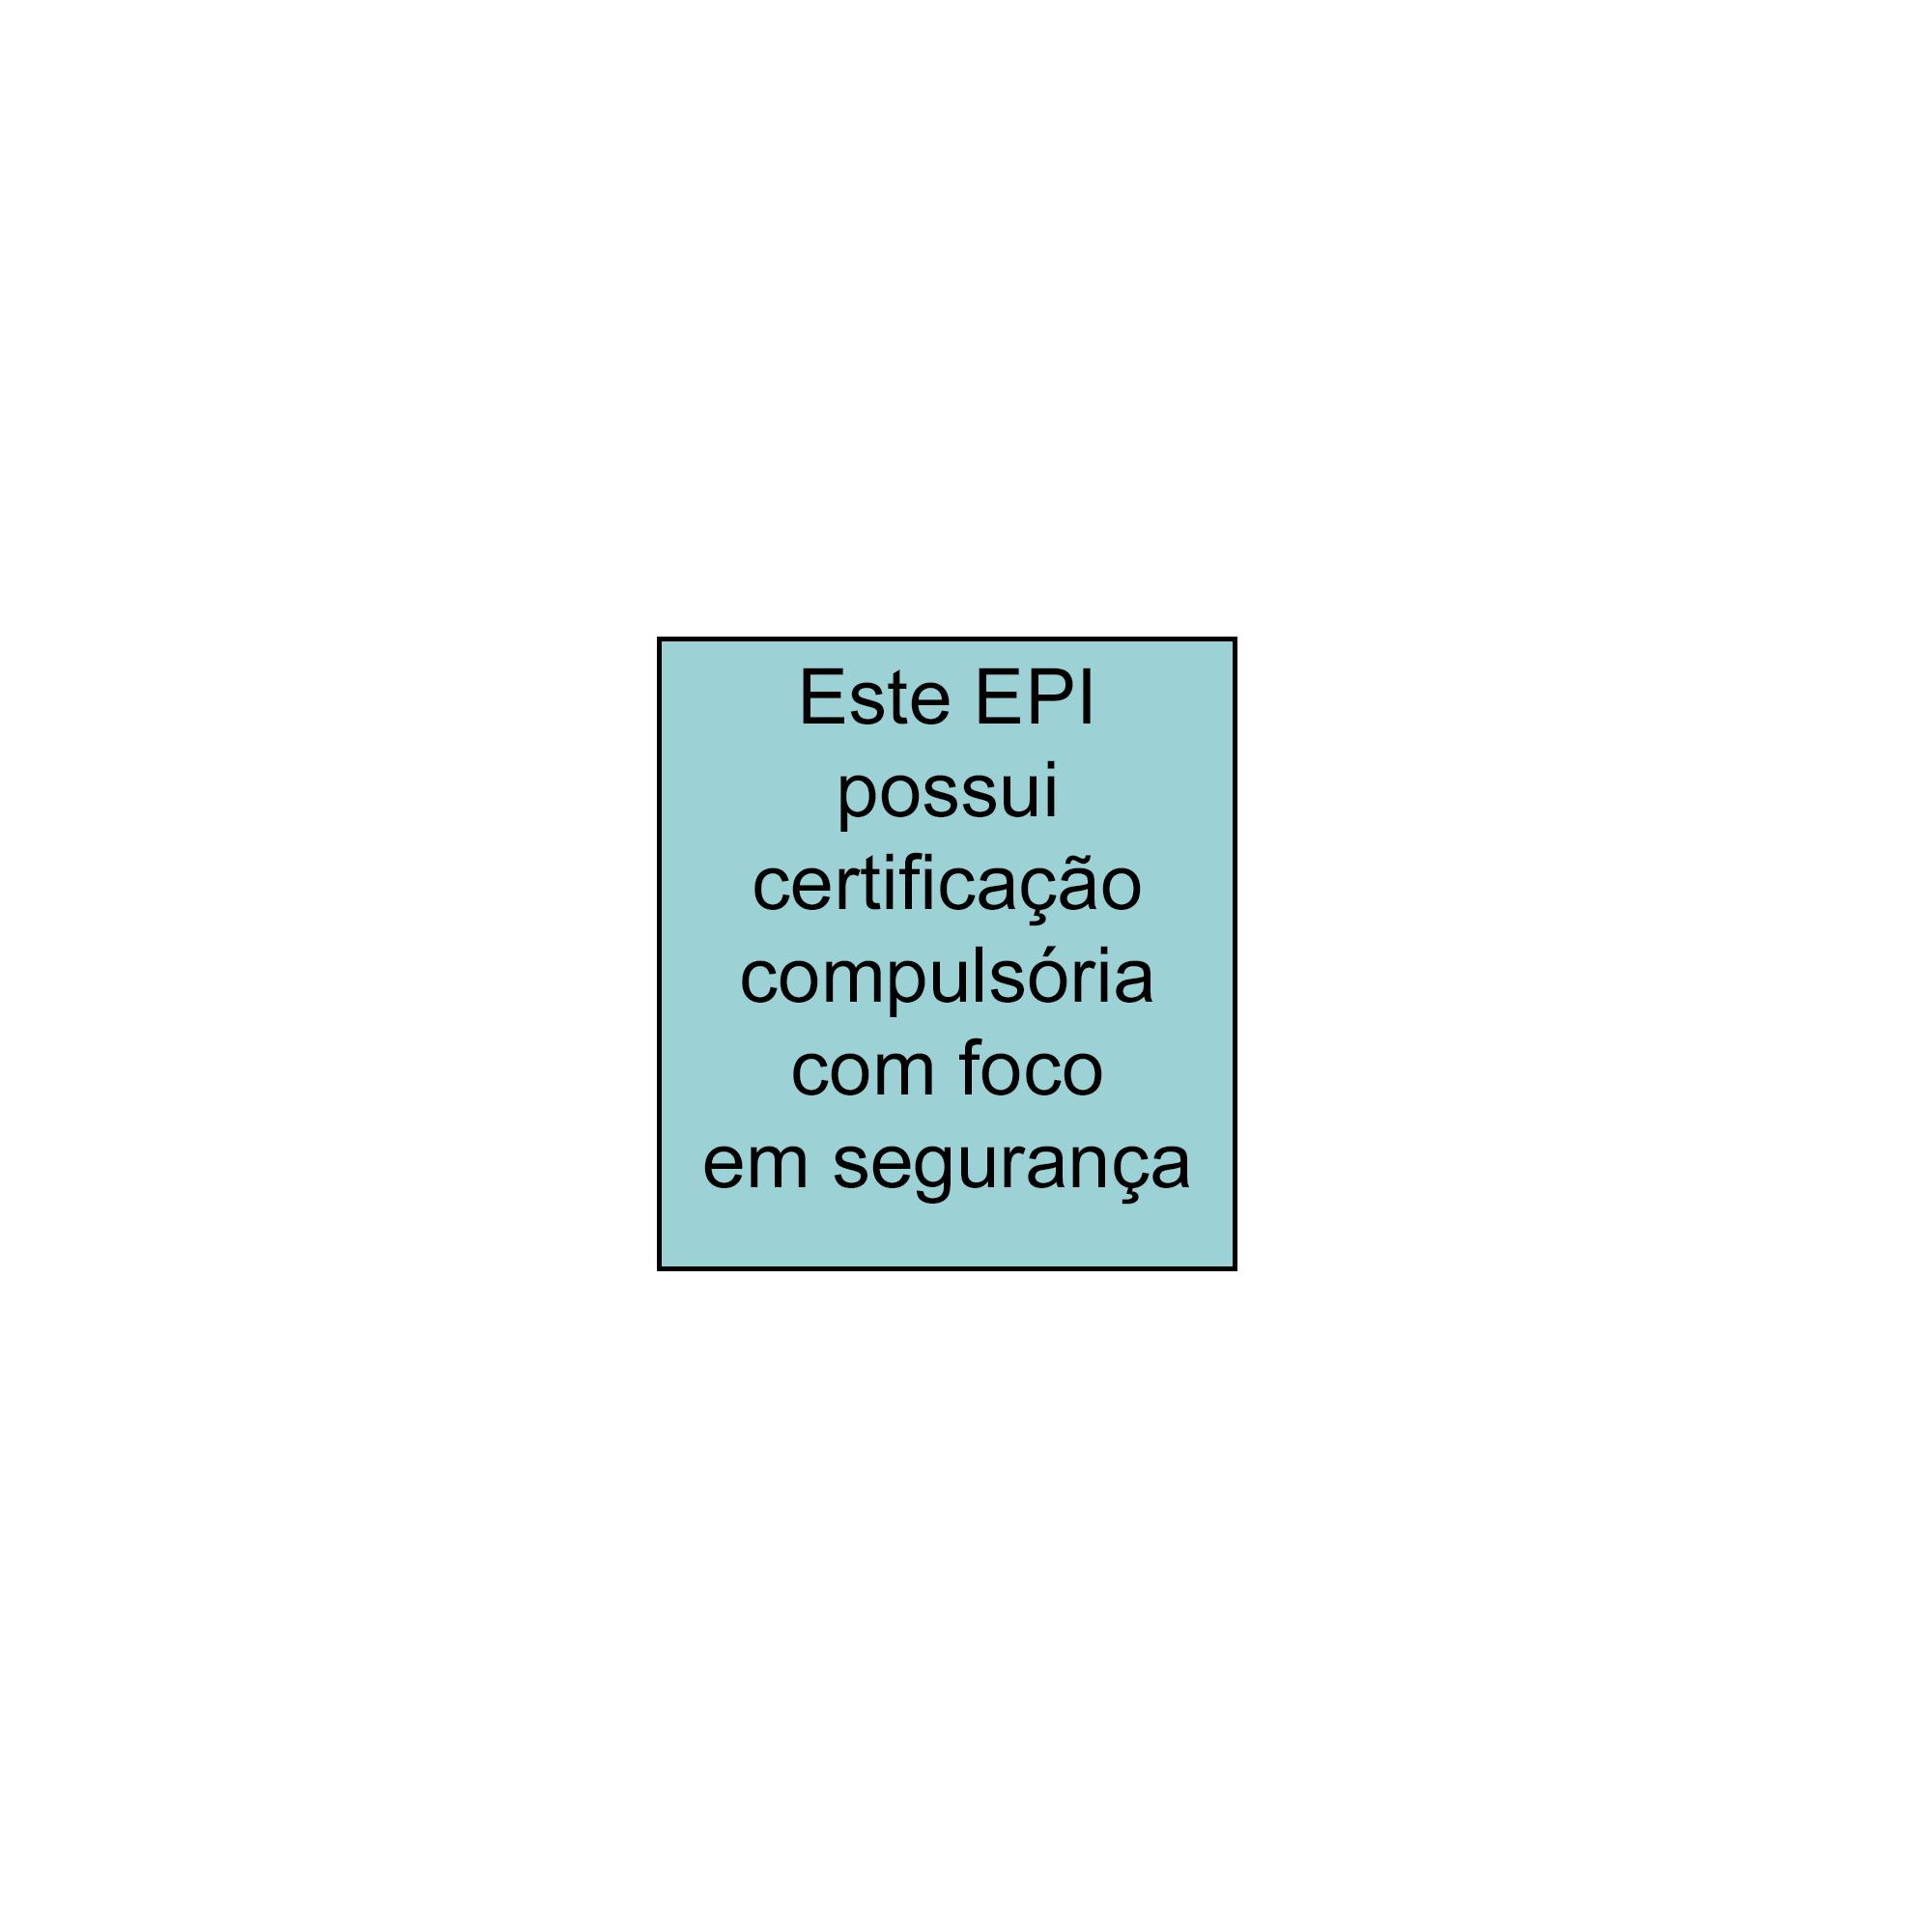 CAPACETE DE SEGURANÇA ABA FRONTAL DELTA PLUS CINZA  - DE PAULA EPIS